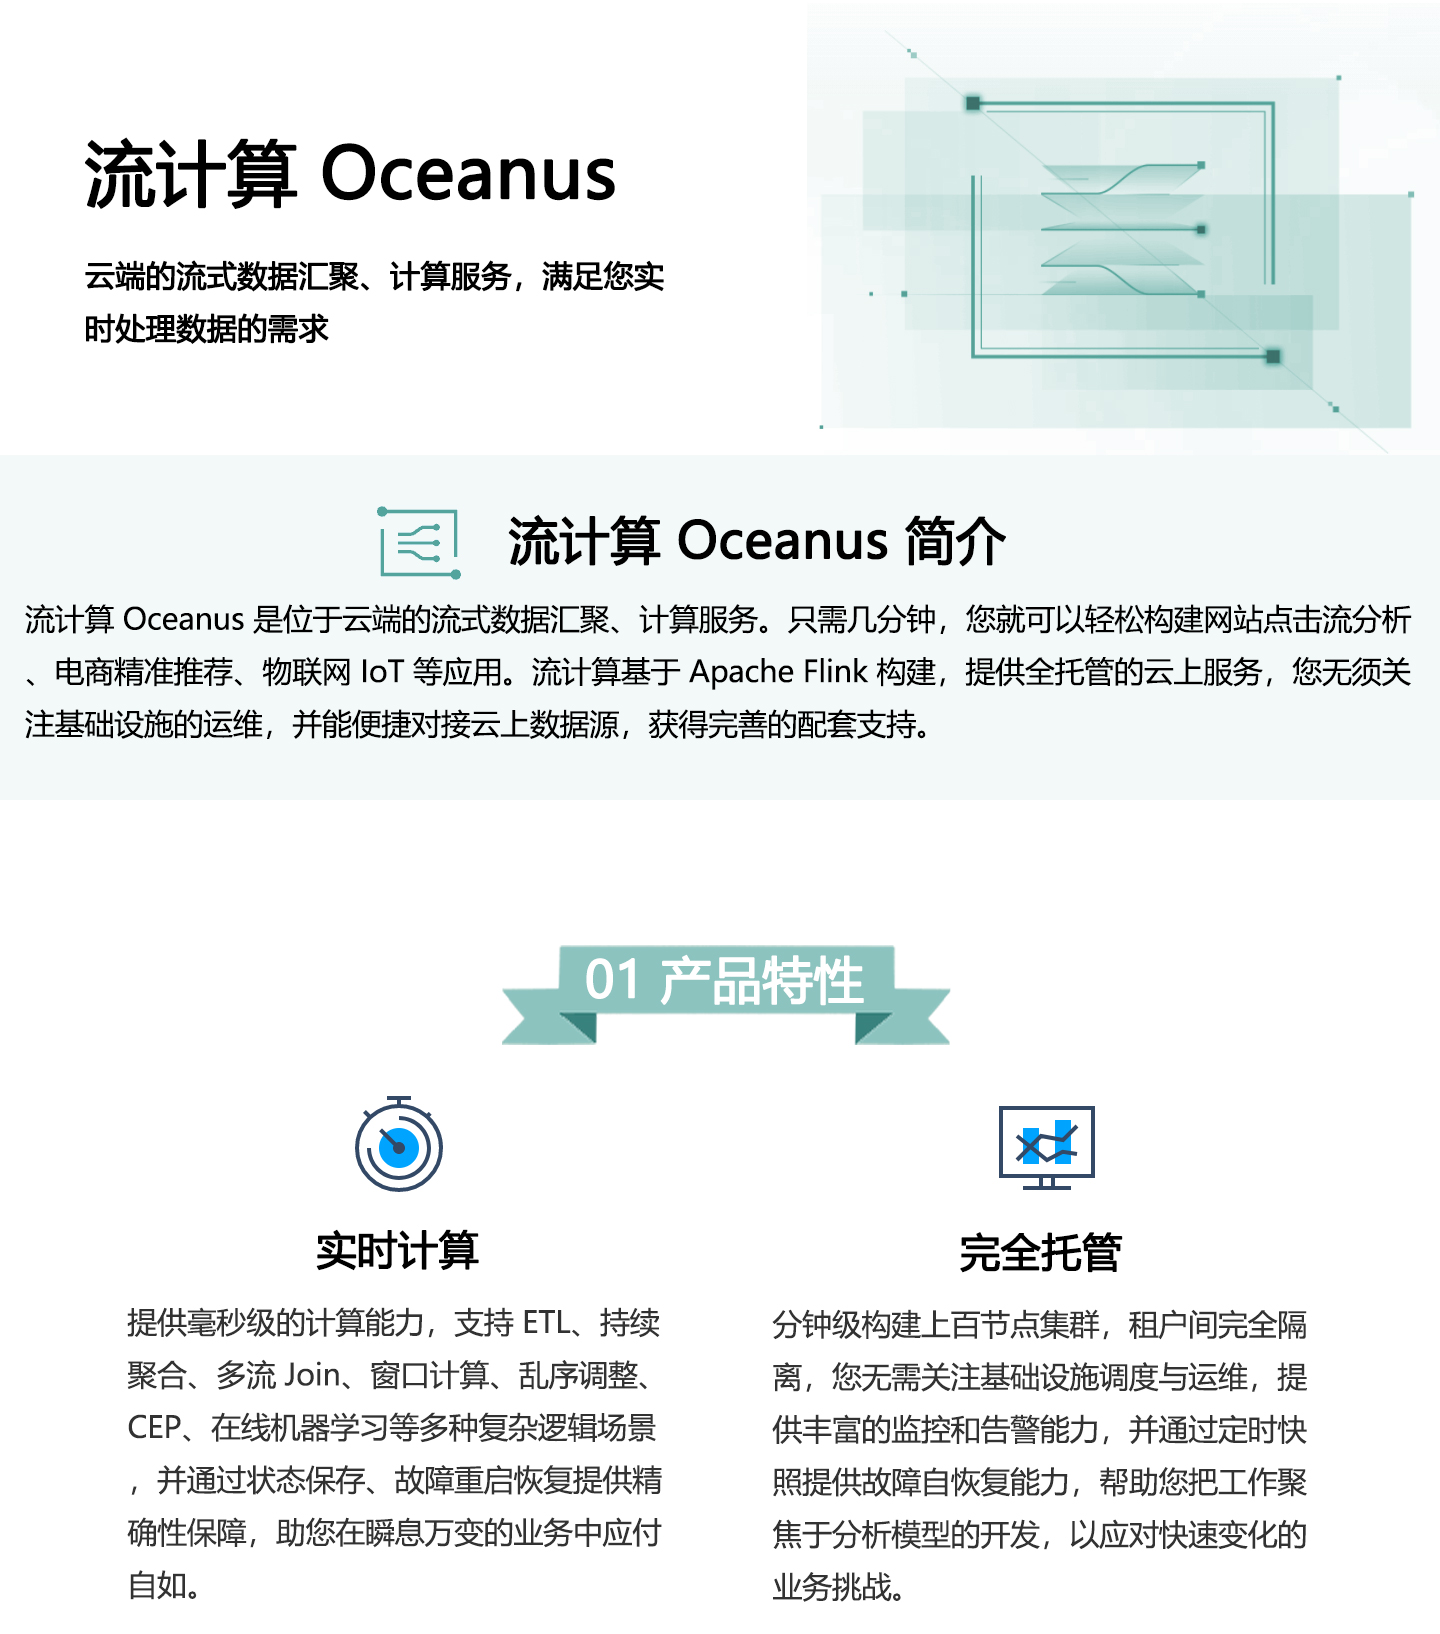 流计算-Oceanus-1440_01.jpg